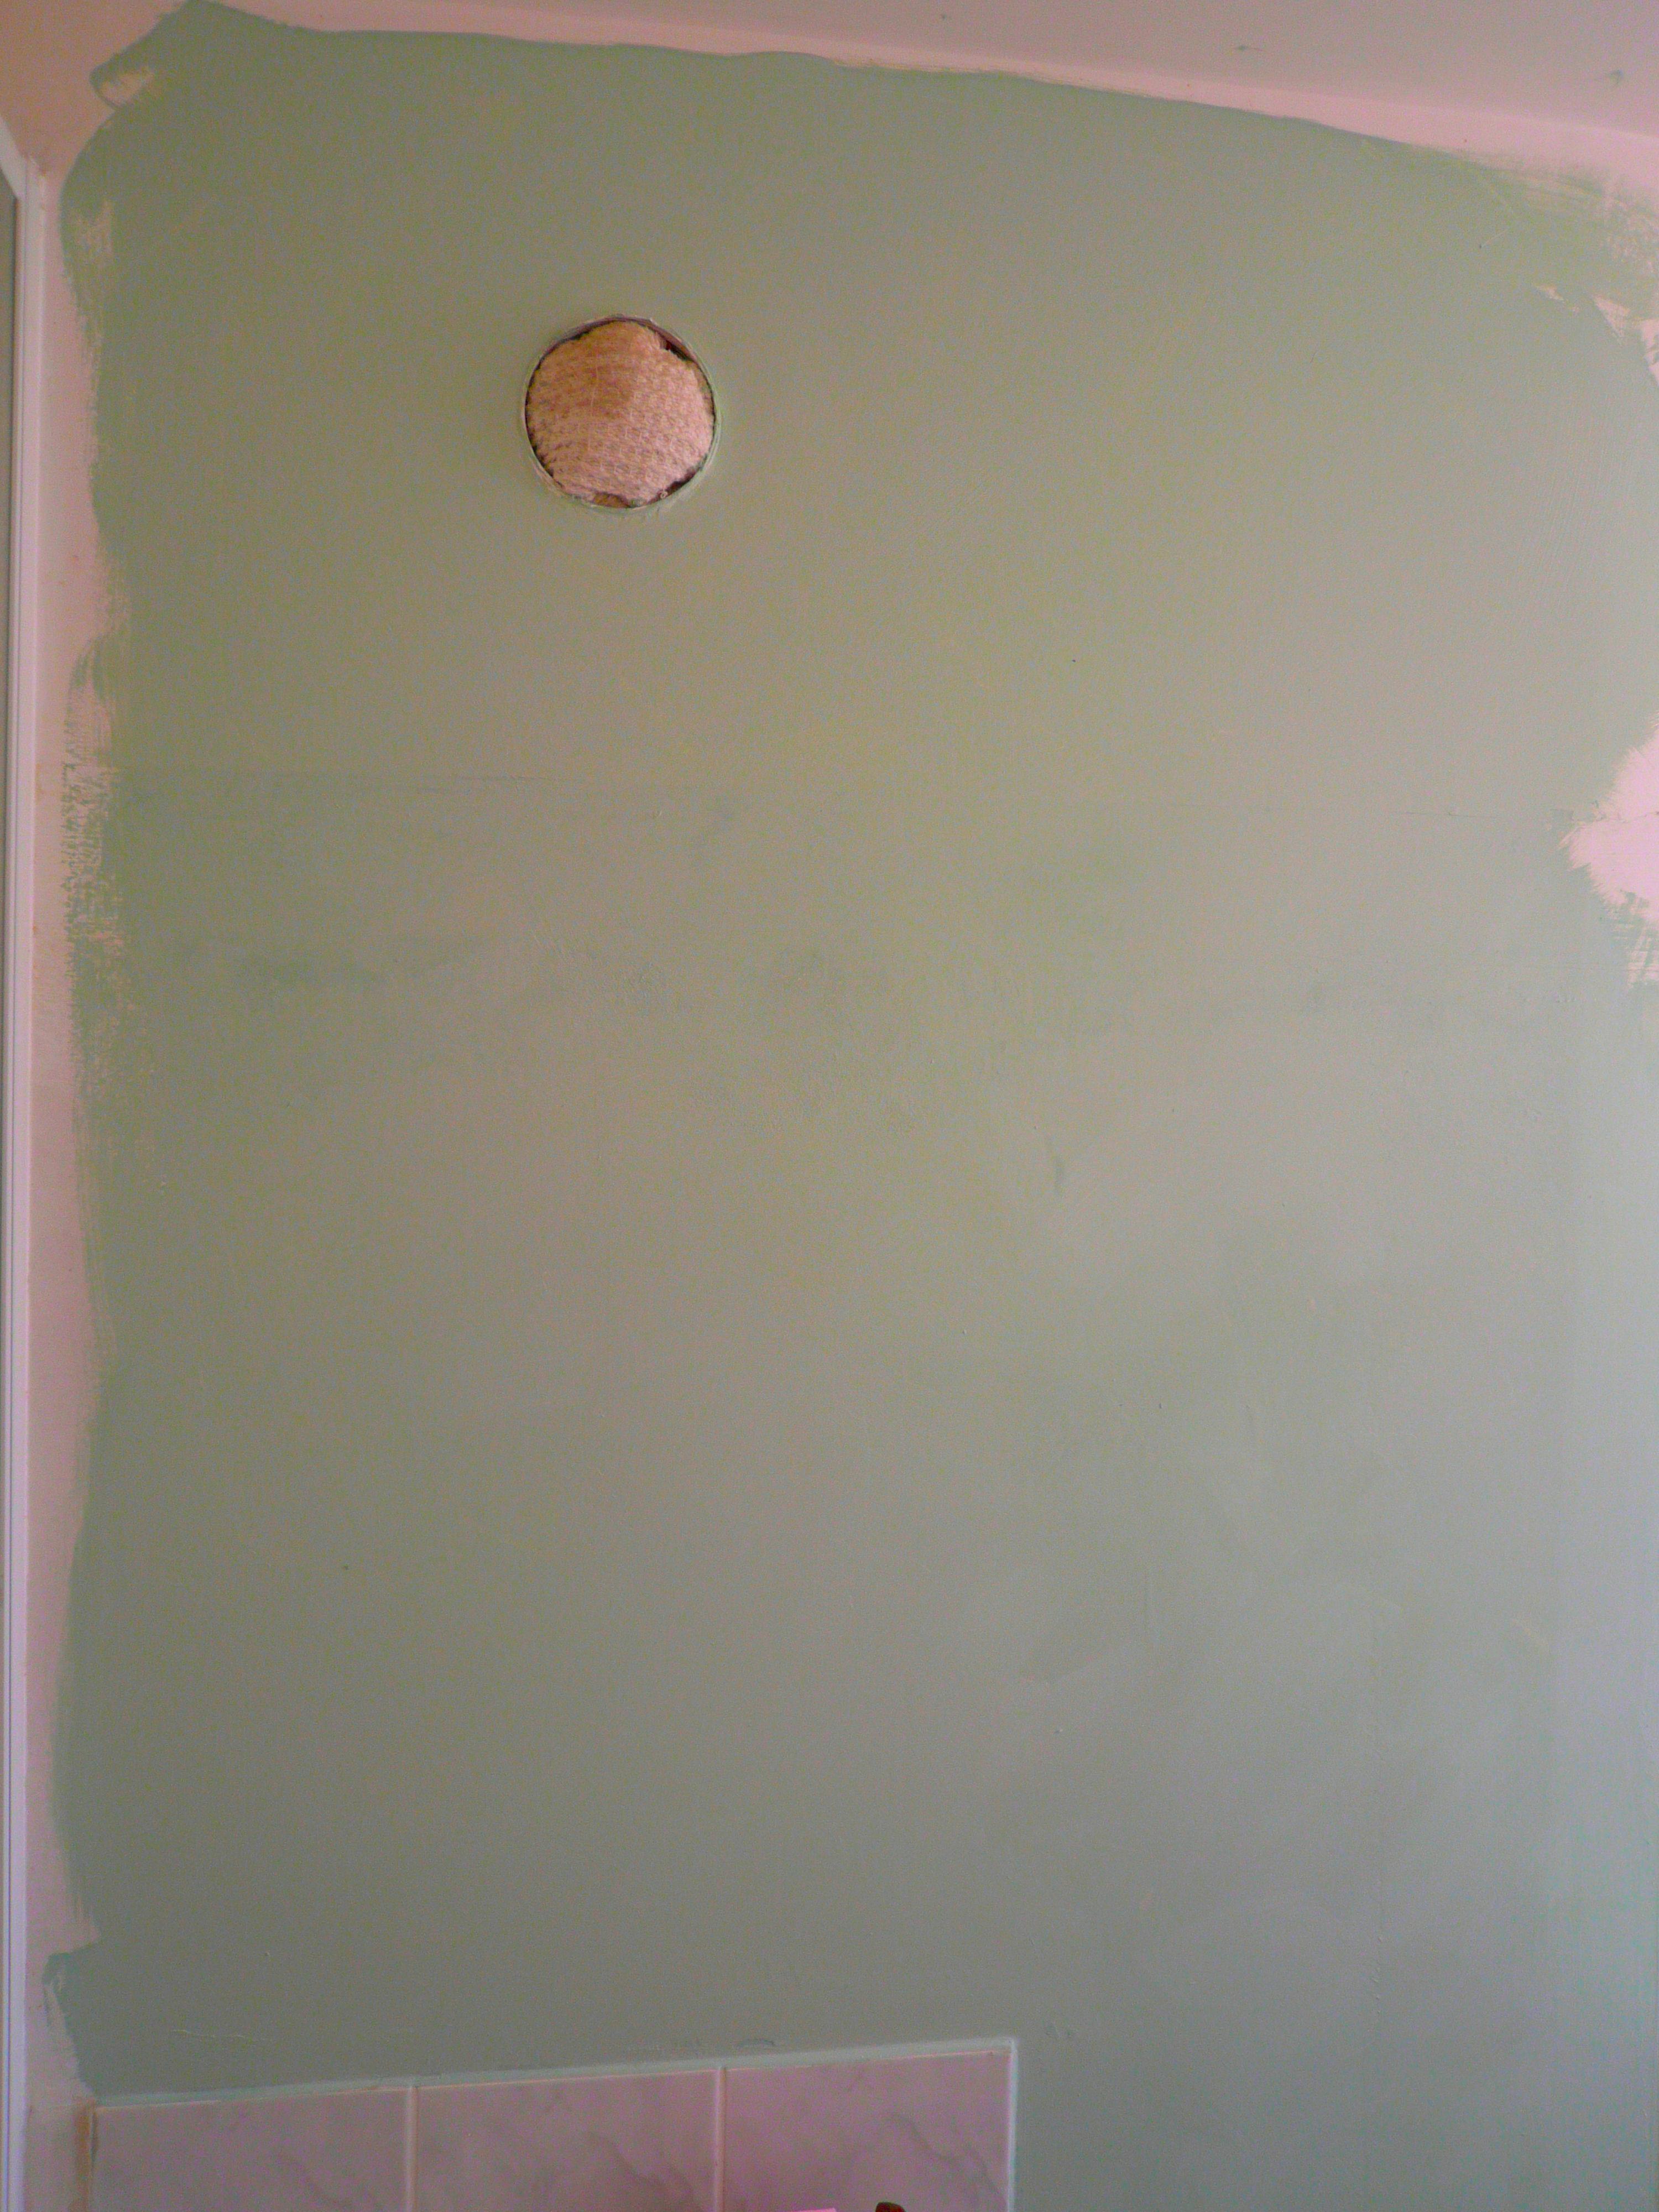 Green verdigris